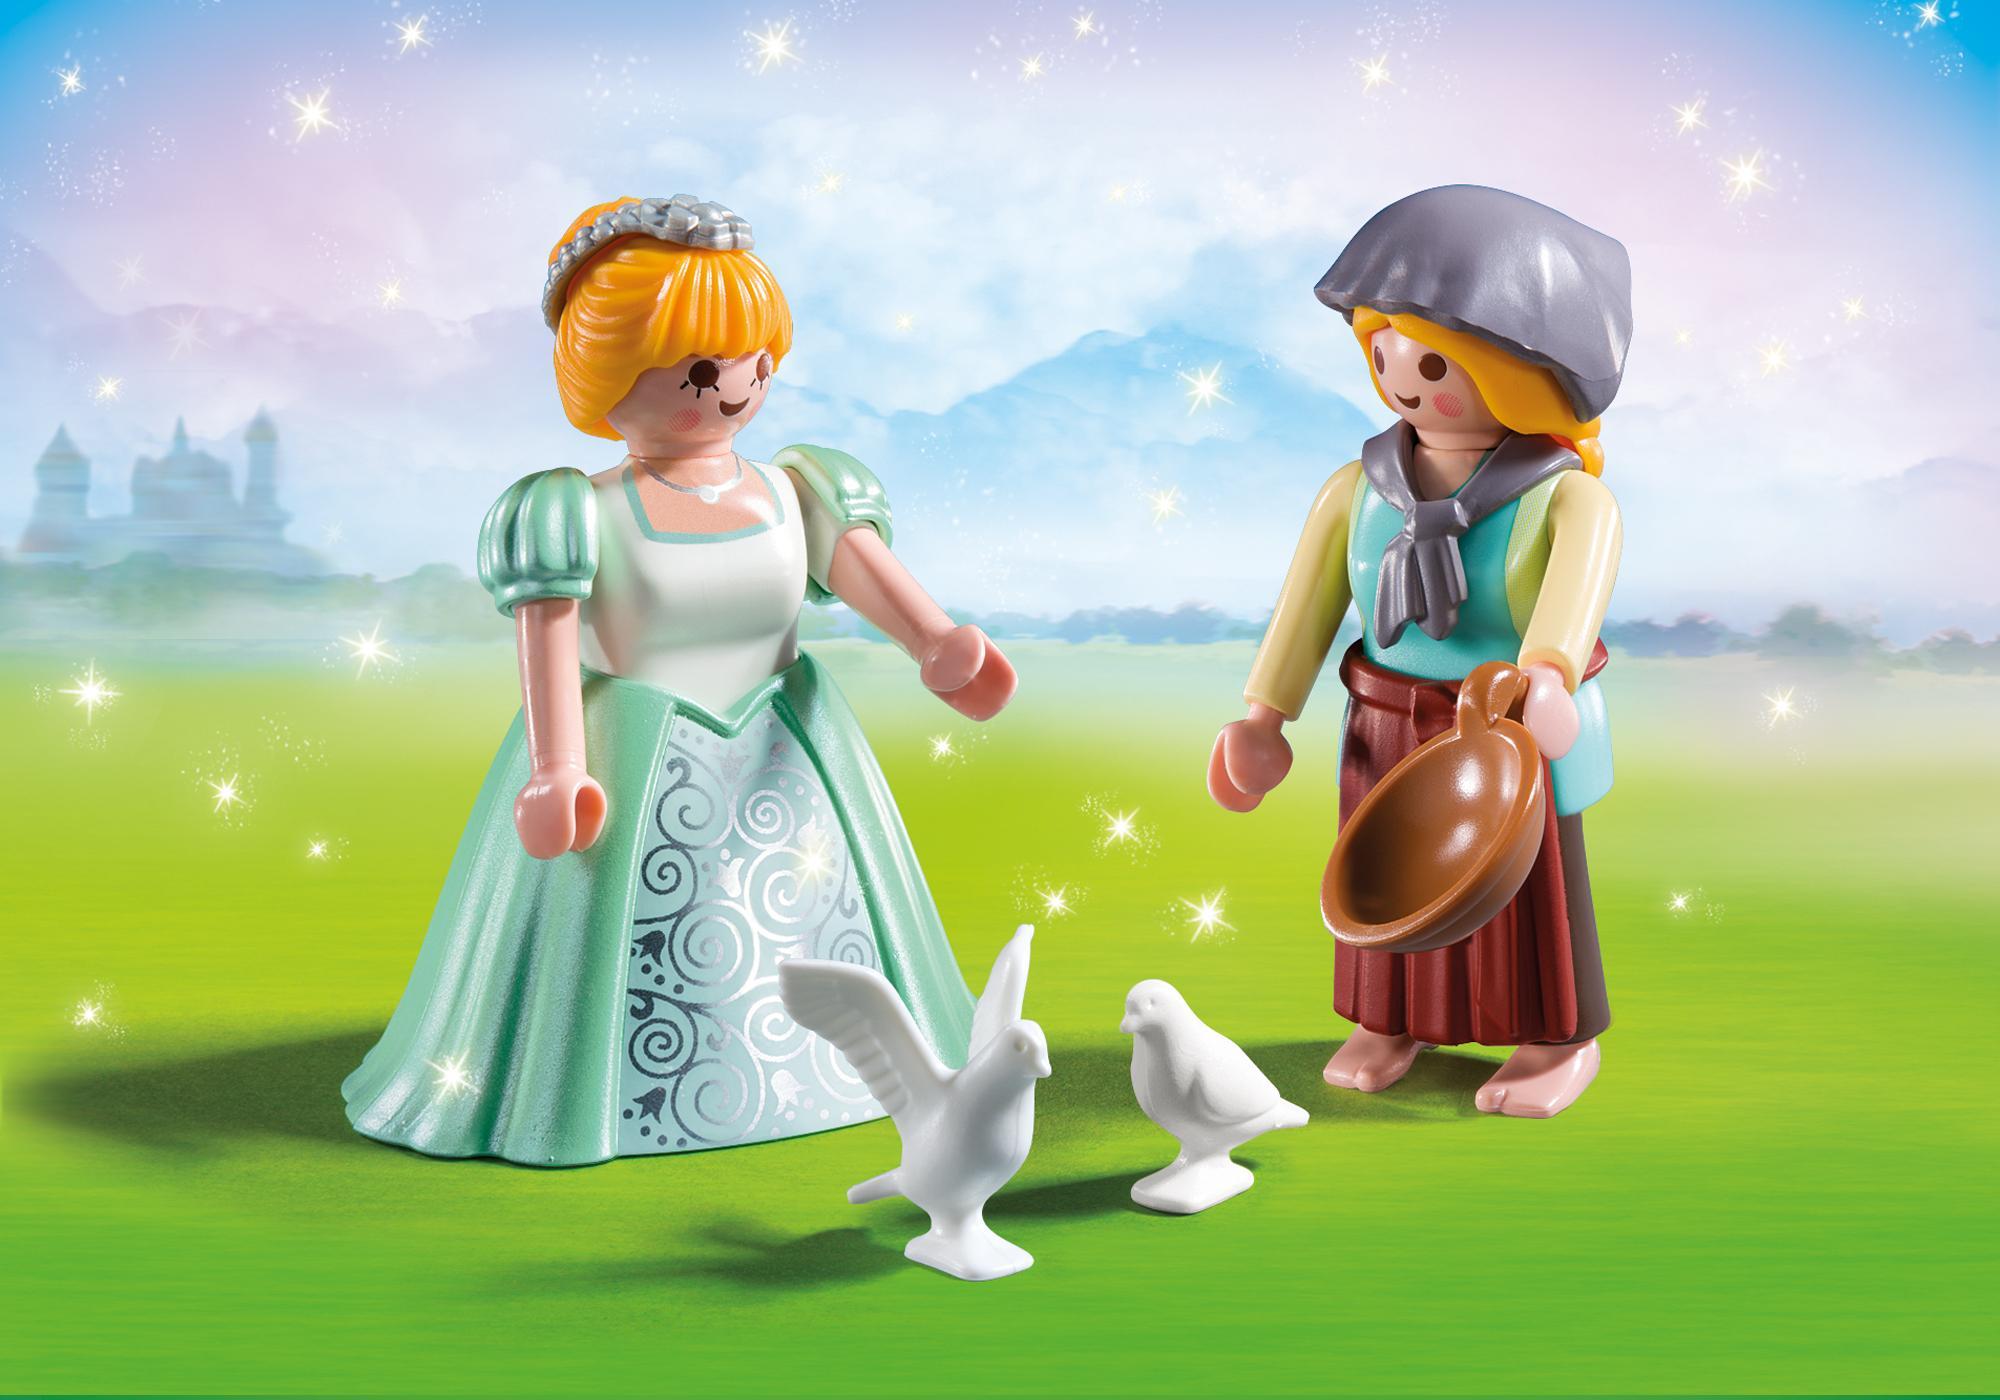 http://media.playmobil.com/i/playmobil/6843_product_detail/ДУО: Принцесса и служанка